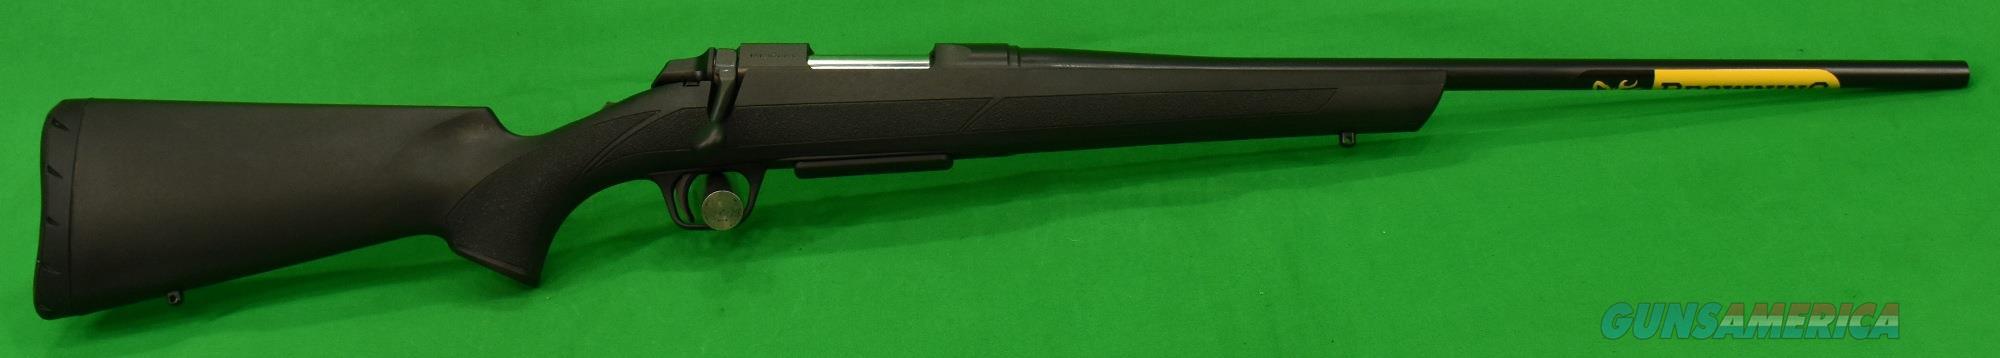 Abolt III Composite Stalker 243Win 22In 035800211  Guns > Rifles > Browning Rifles > Bolt Action > Hunting > Blue